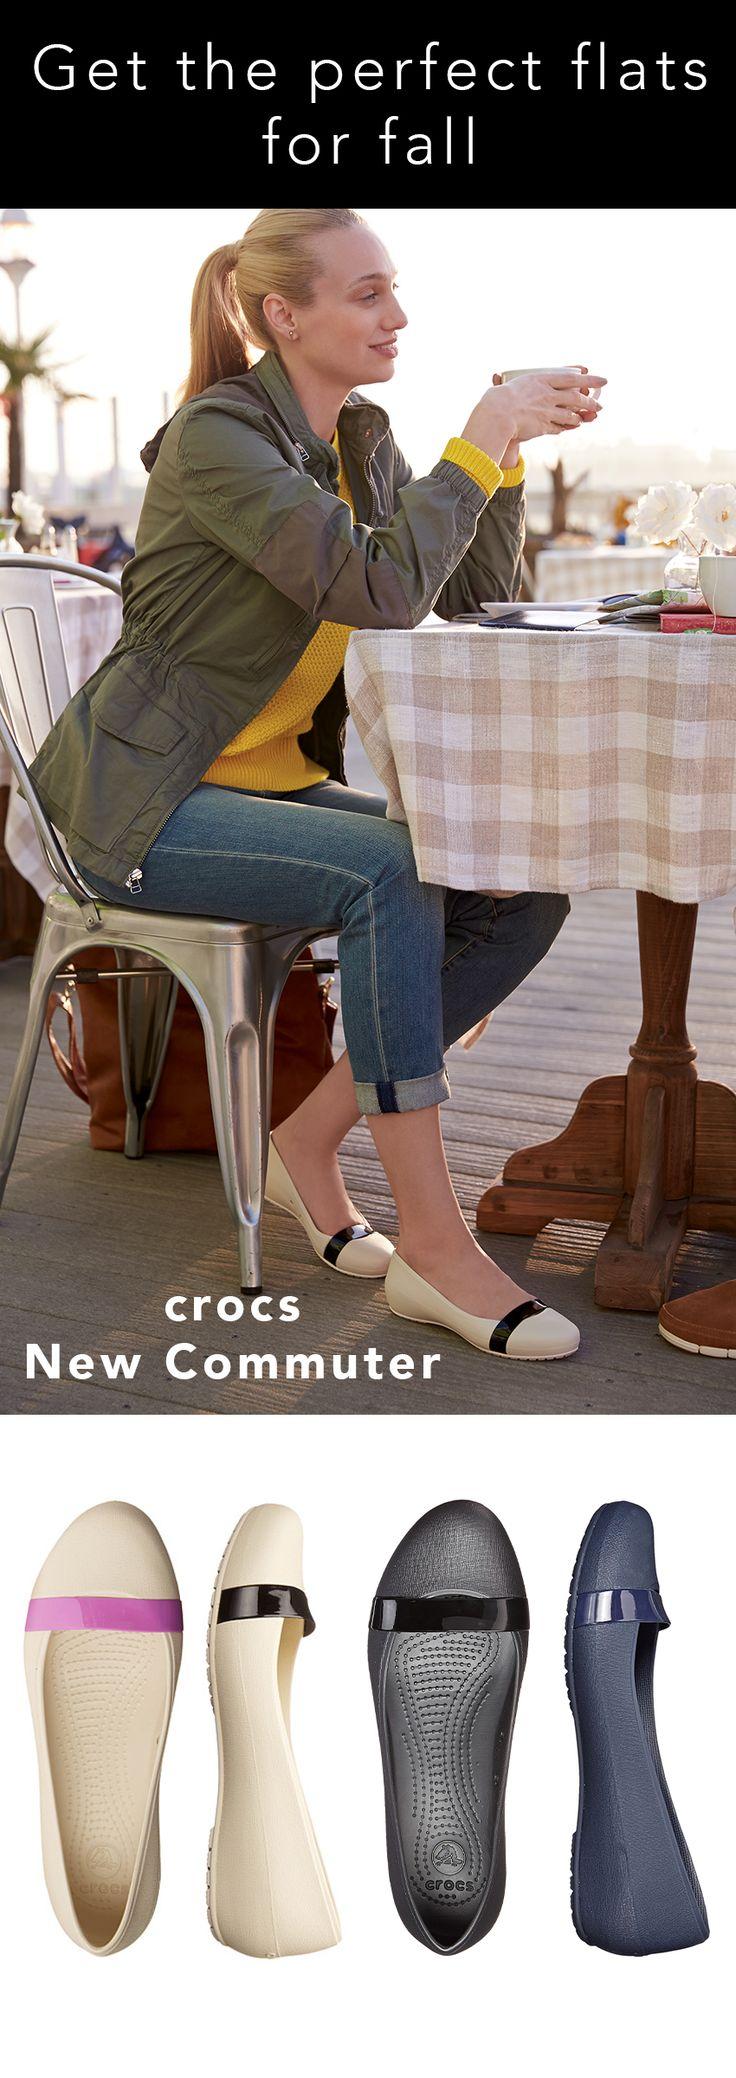 Crocs New Commuter Plain Strap Flat   WKPO6VV4